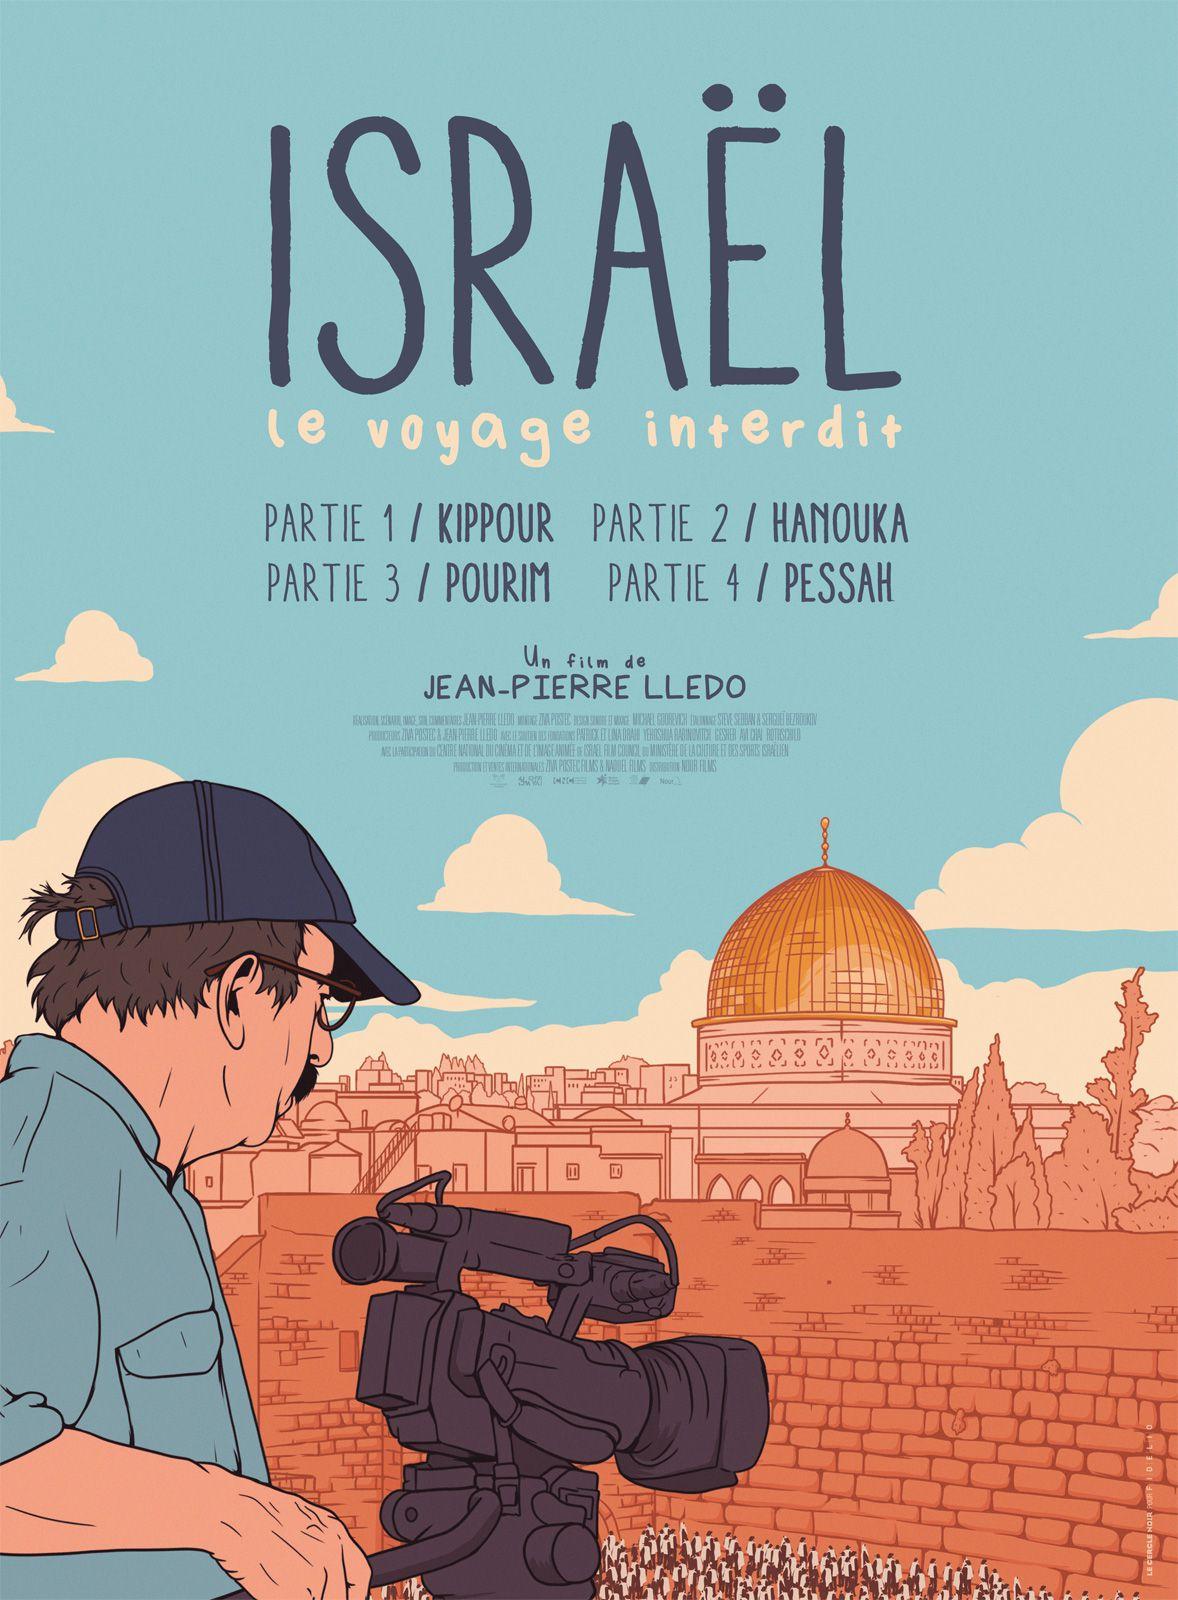 Israël, le voyage interdit - Partie III : Pourim - Documentaire (2020)